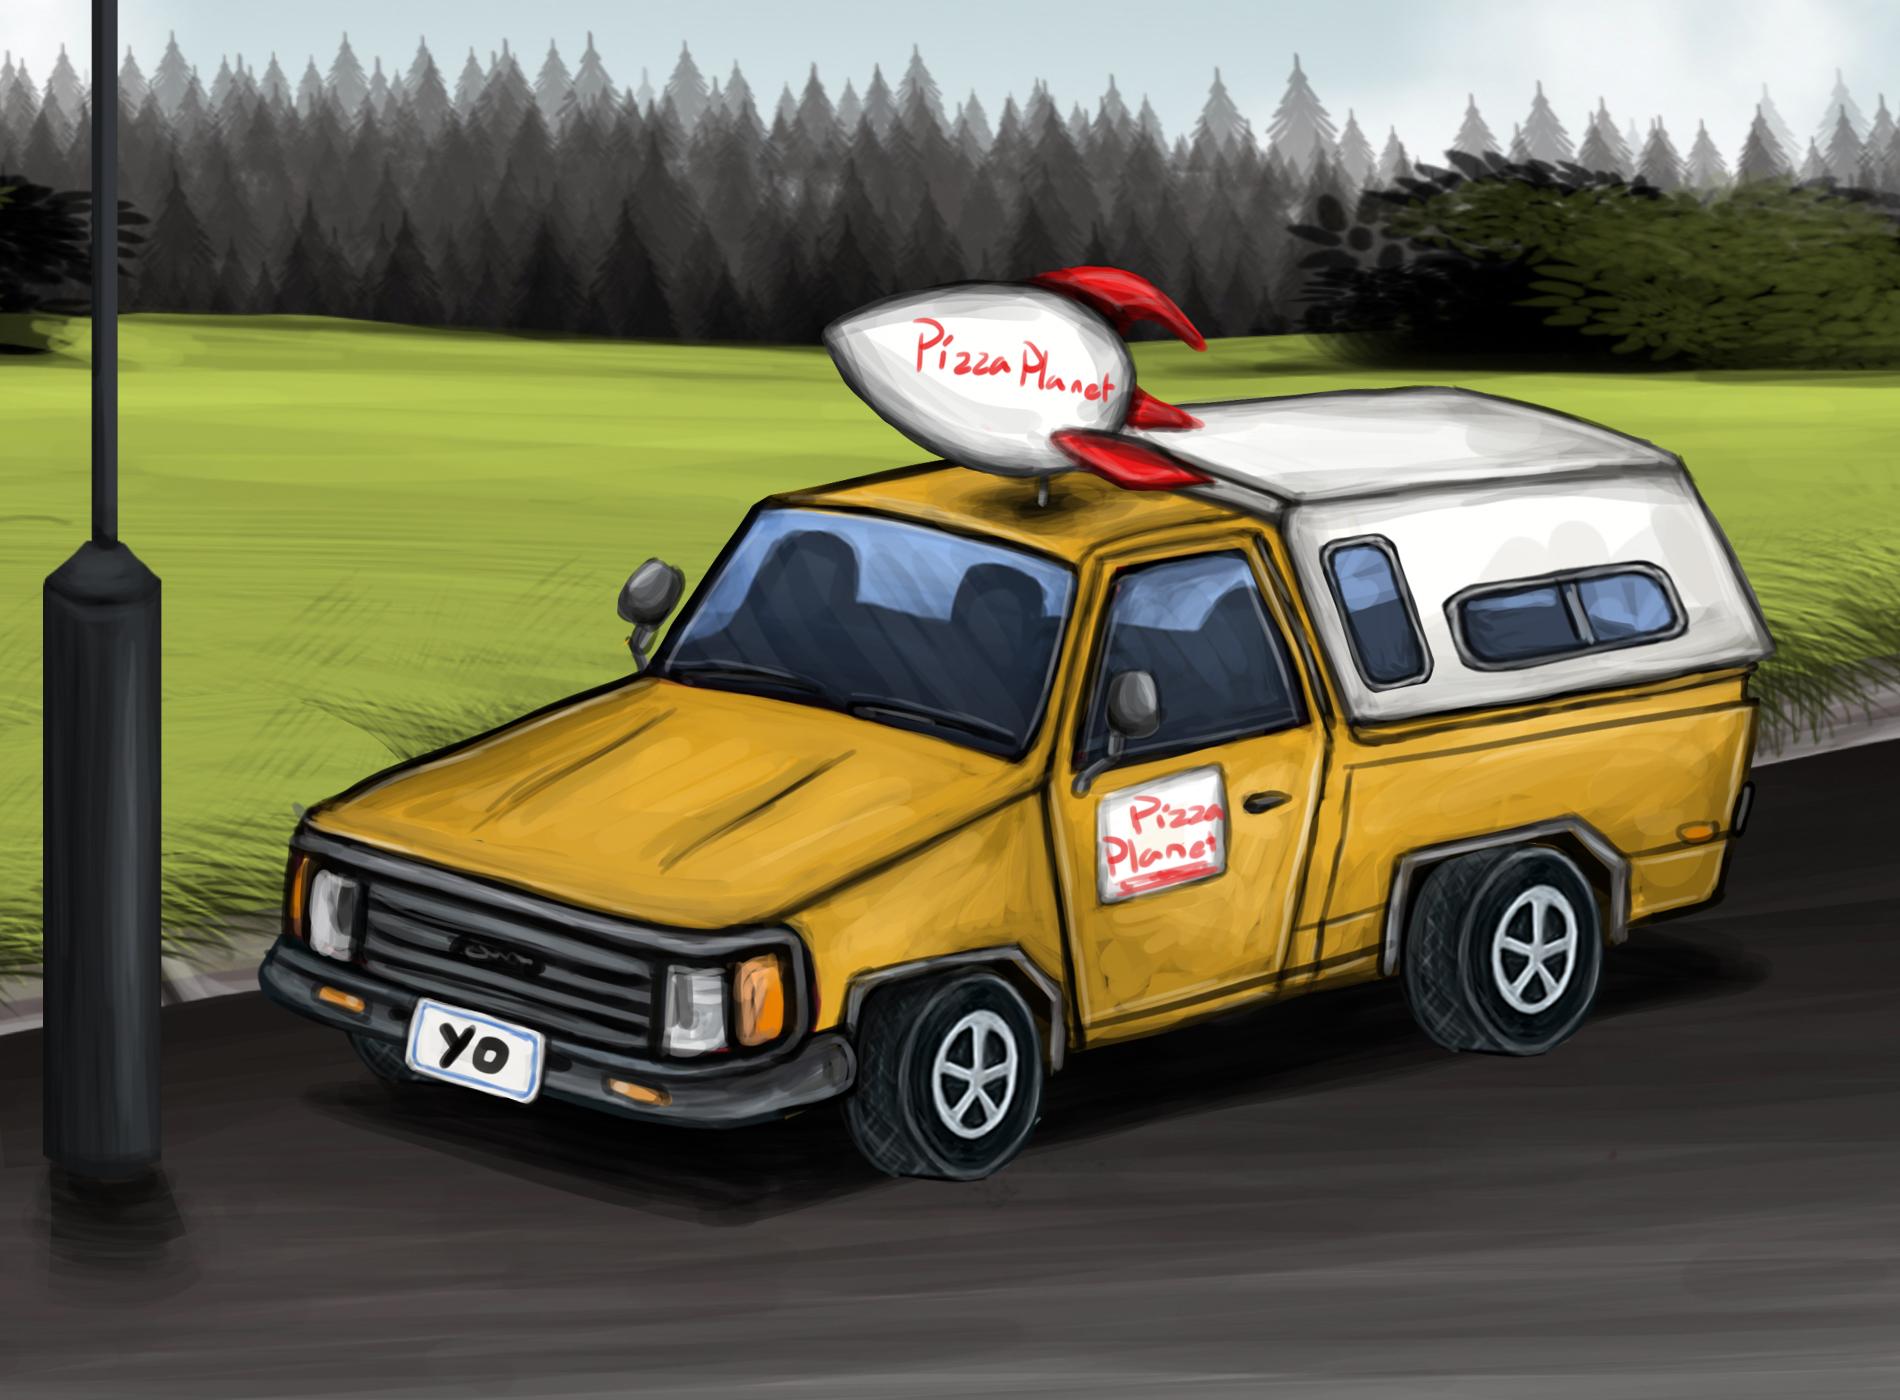 Pizza Planet Truck By Louisetheanimator On Deviantart